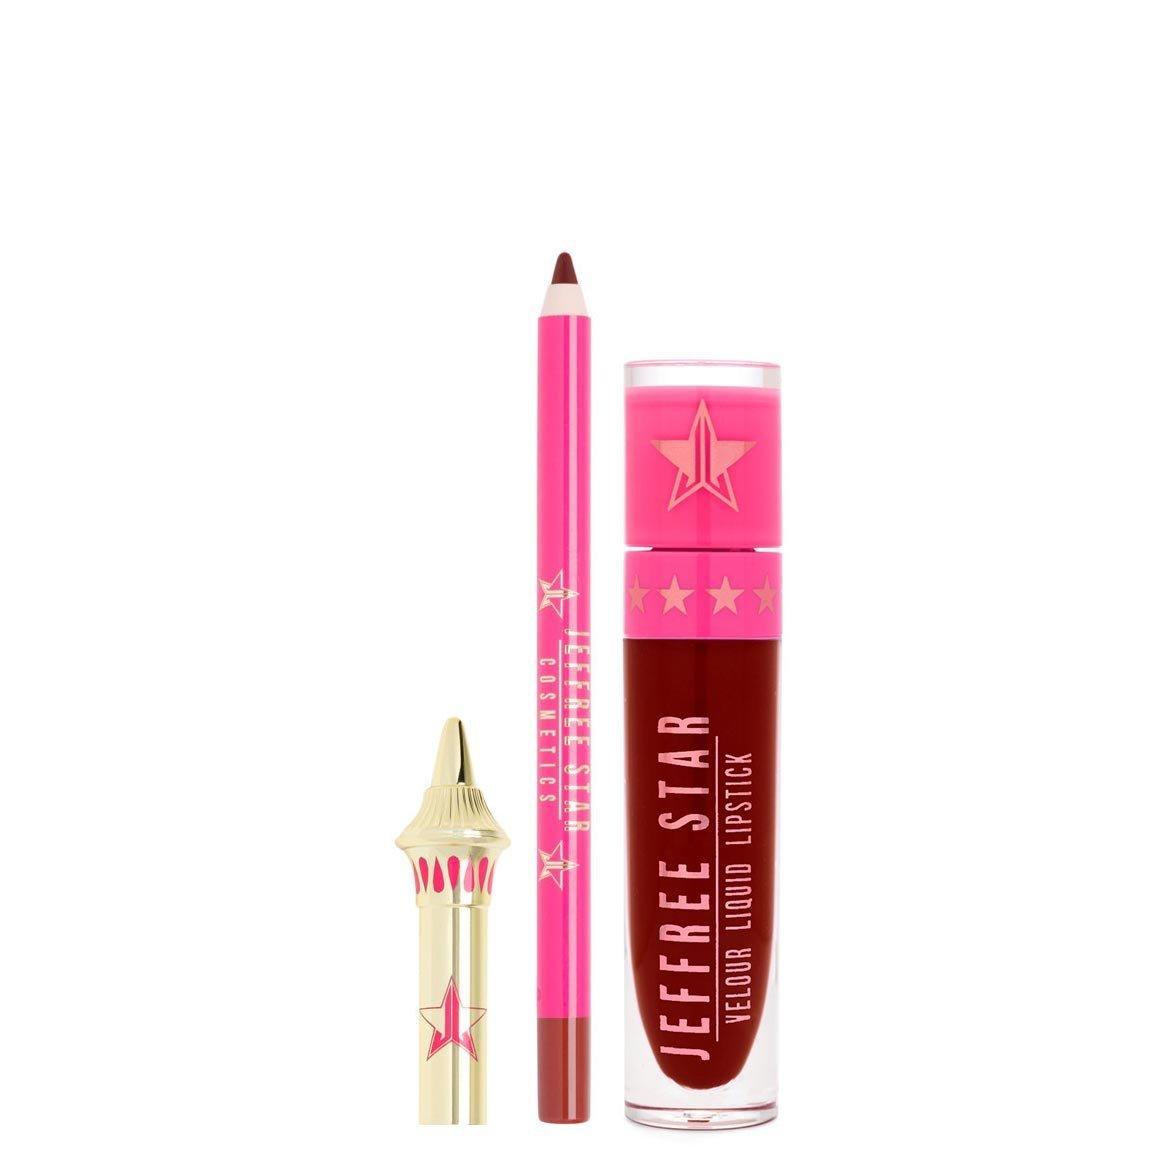 Jeffree Star Cosmetics Velour Lip Kit Unicorn Blood